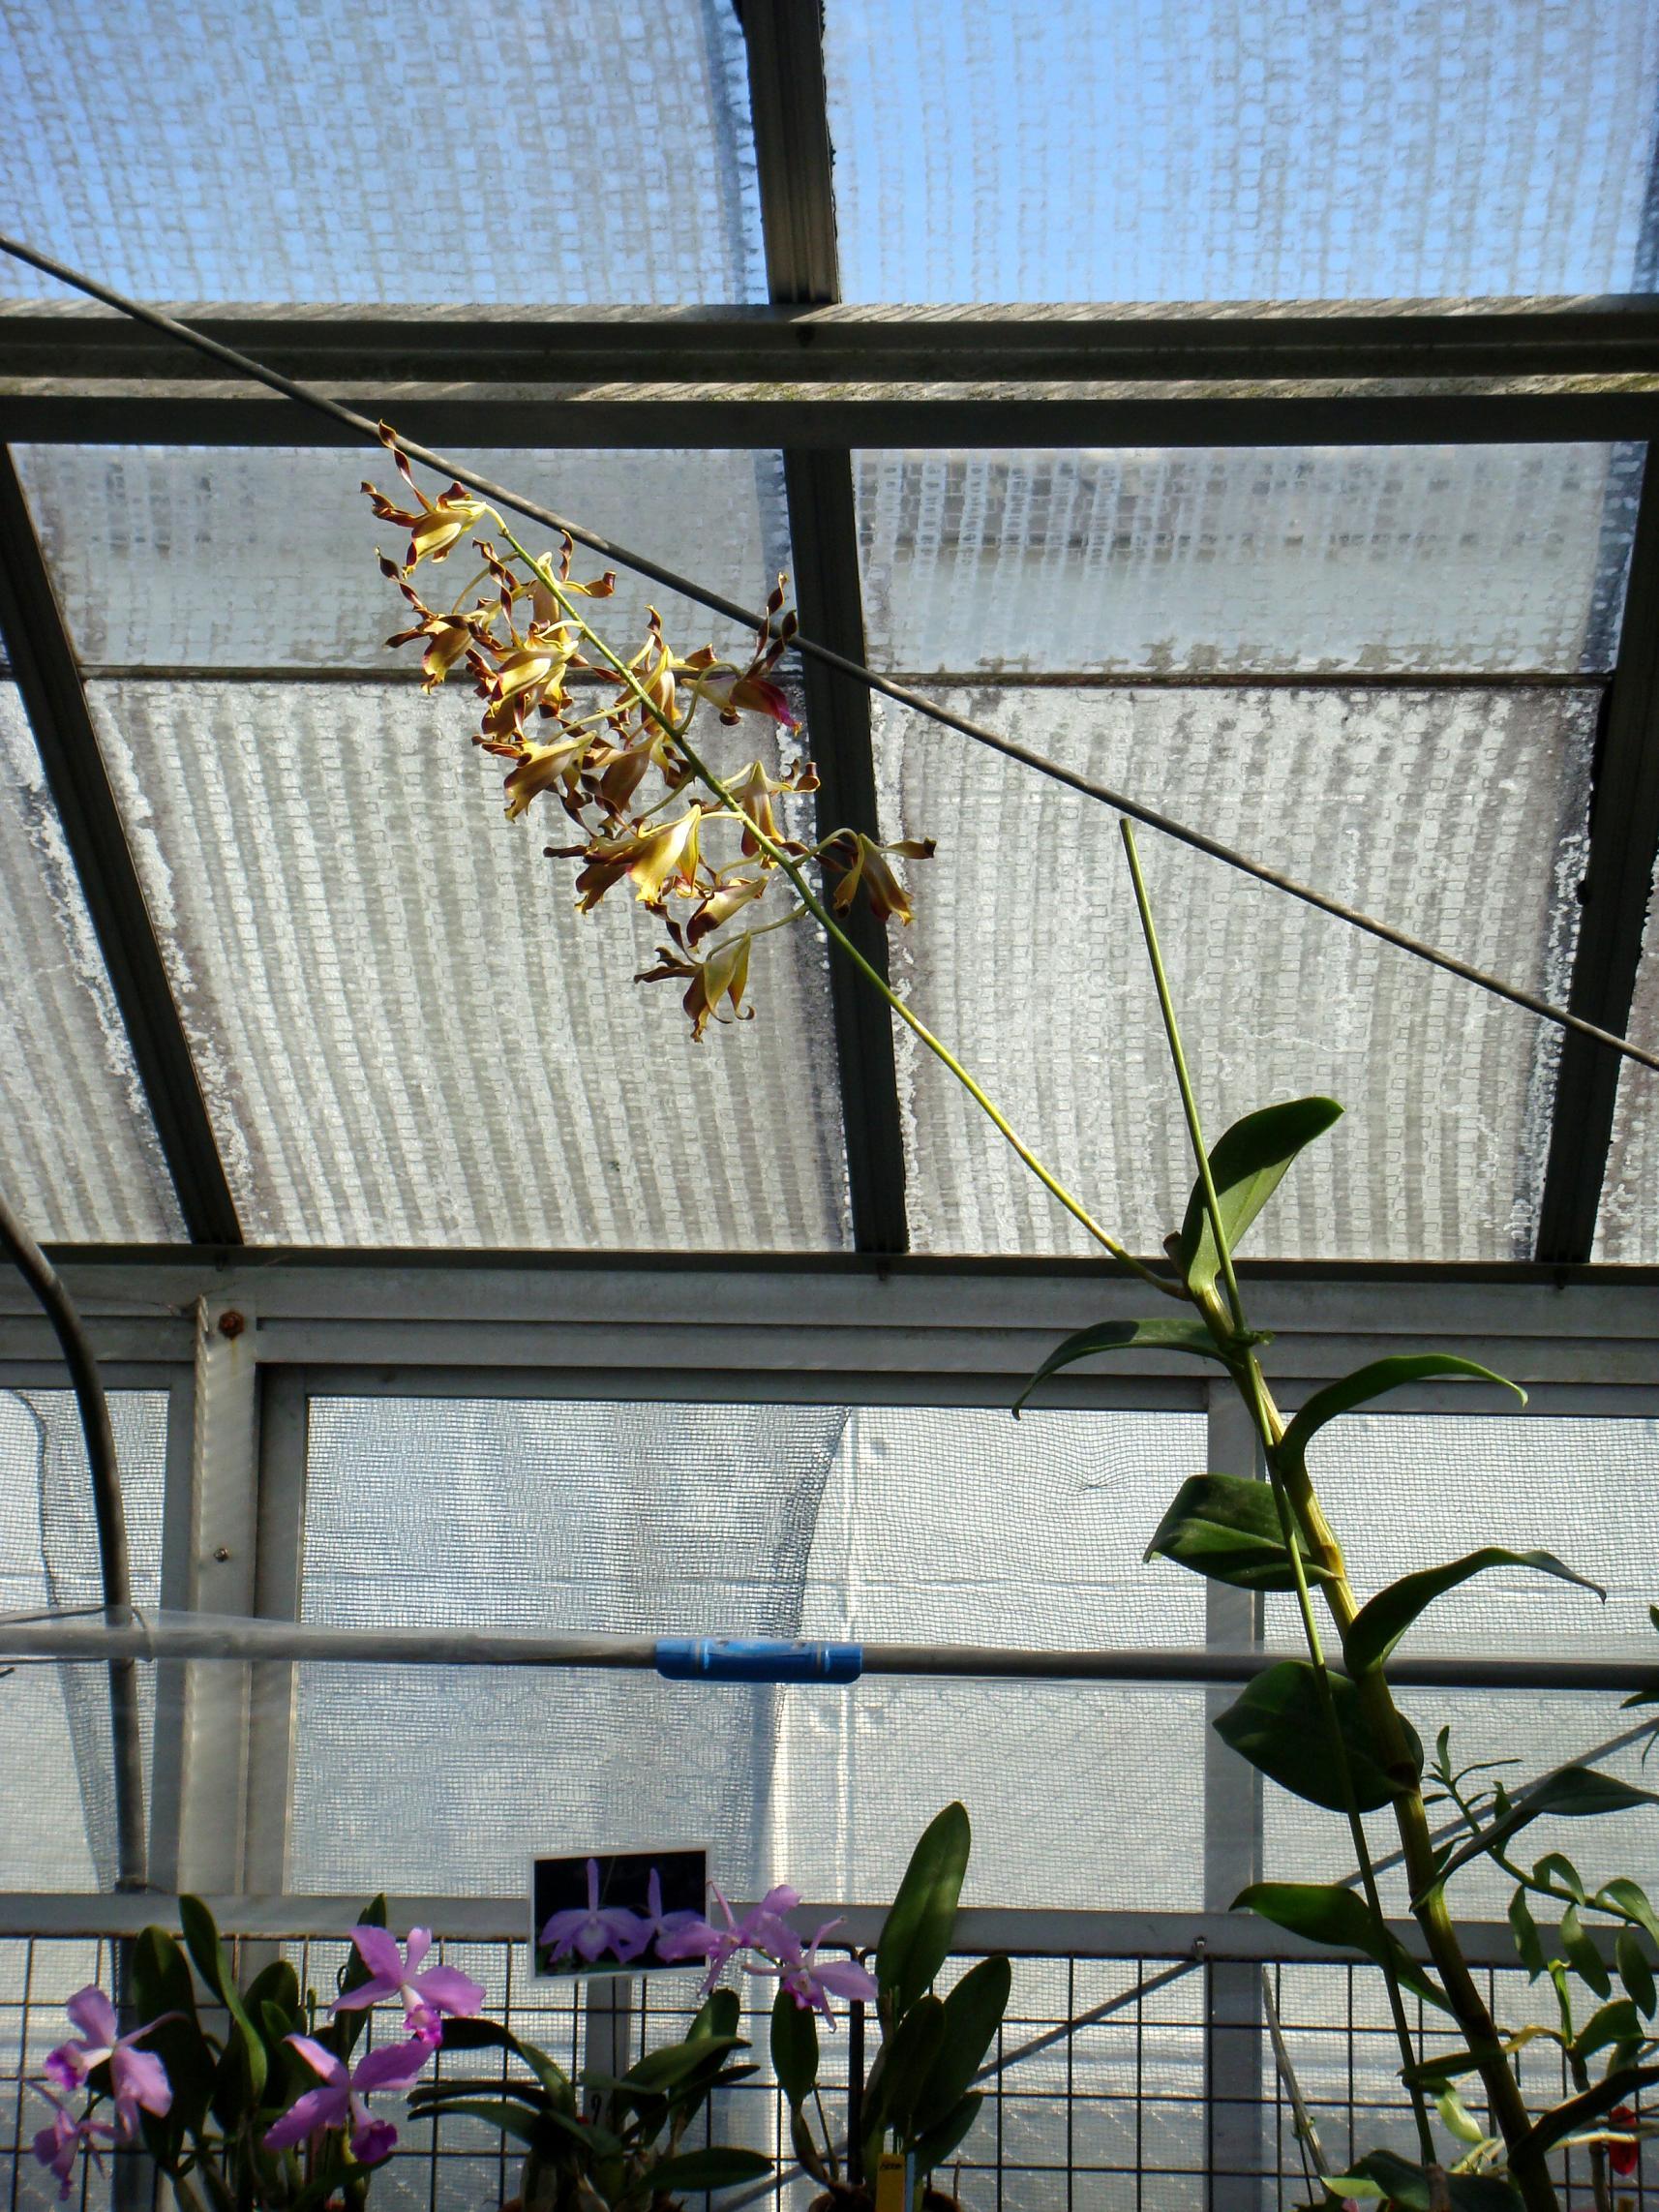 http://orchids.la.coocan.jp/Dendrobium/Dendrobium%20lasianthera/DSC03750.JPG